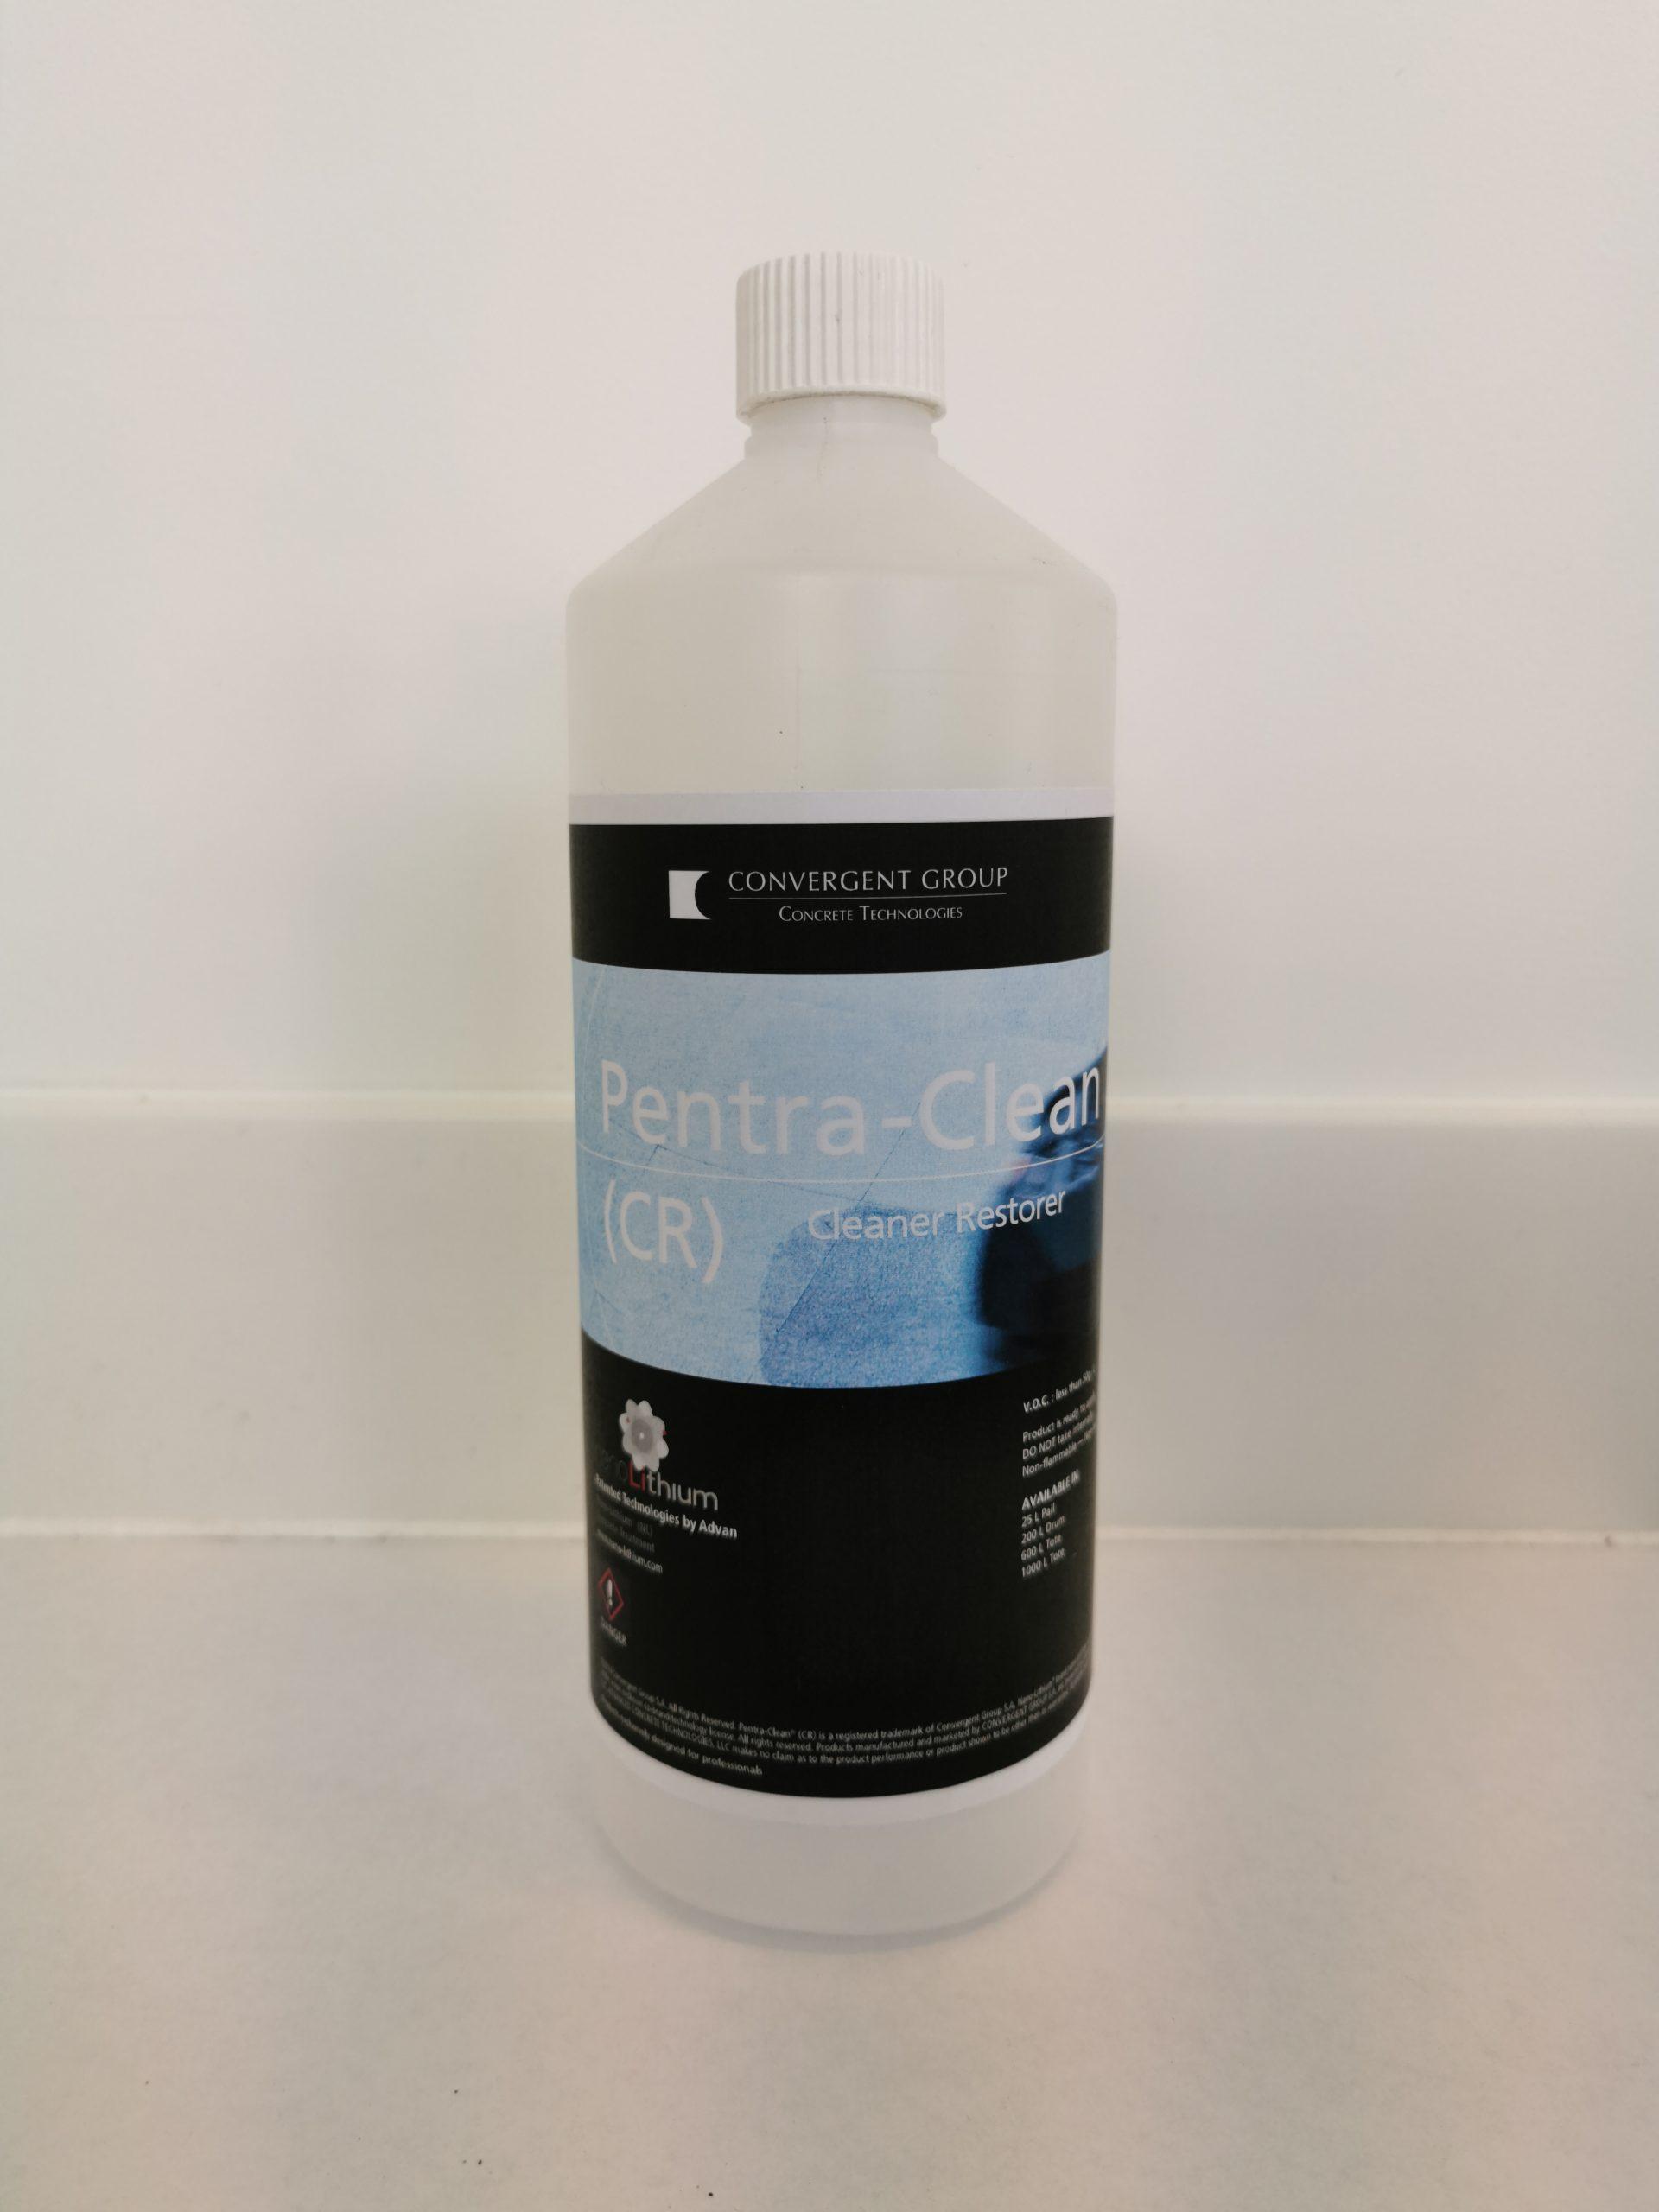 bottole of Pentra Clean Cleaner Restorer